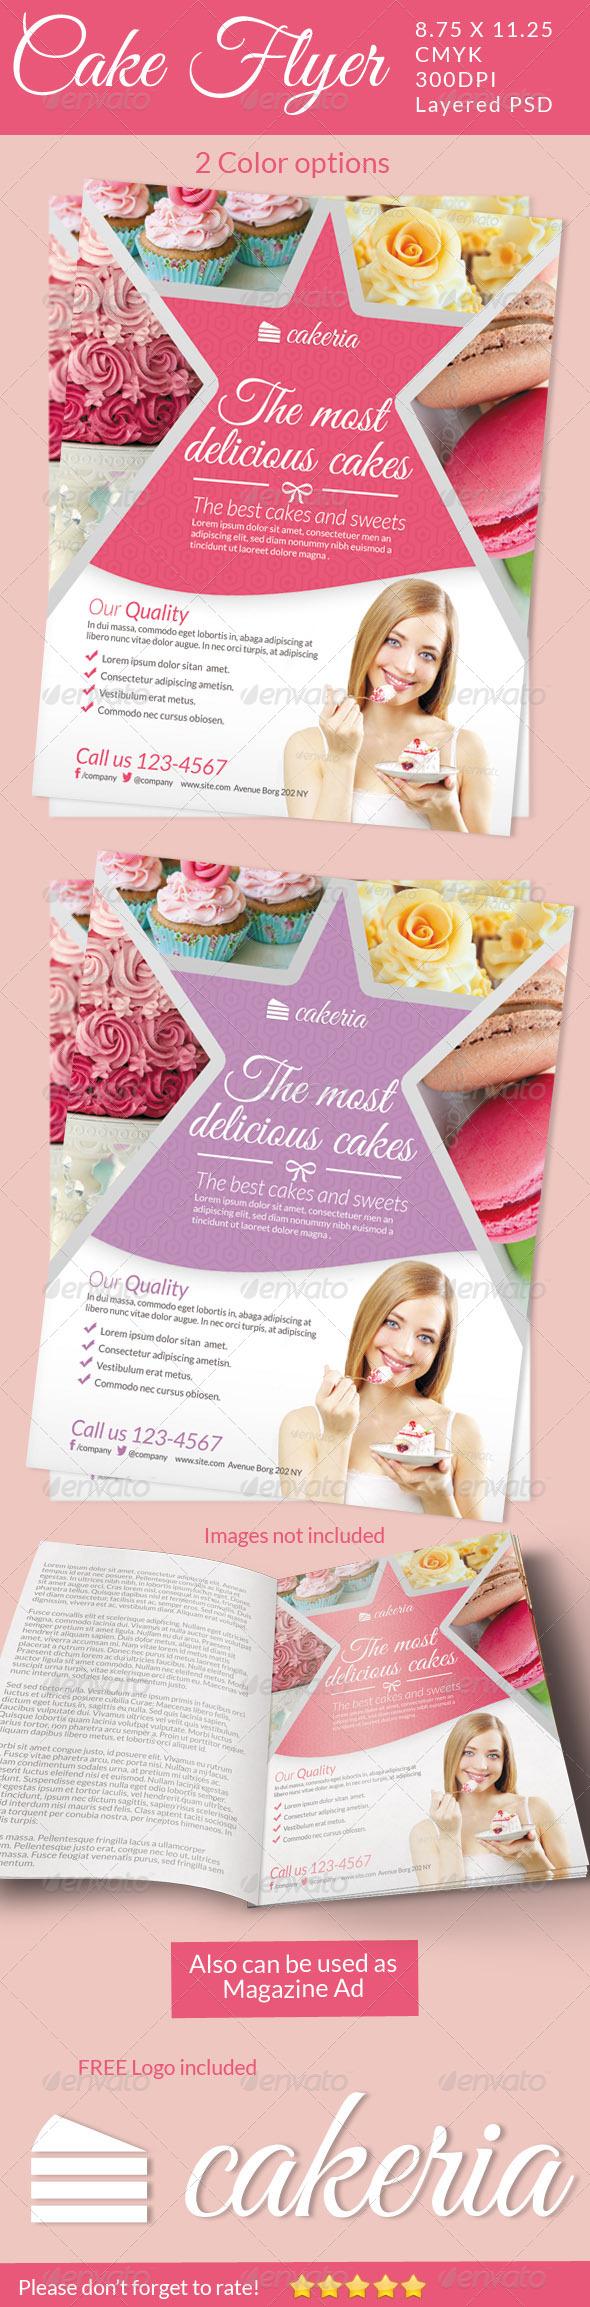 Cake Flyer Magazine Ad